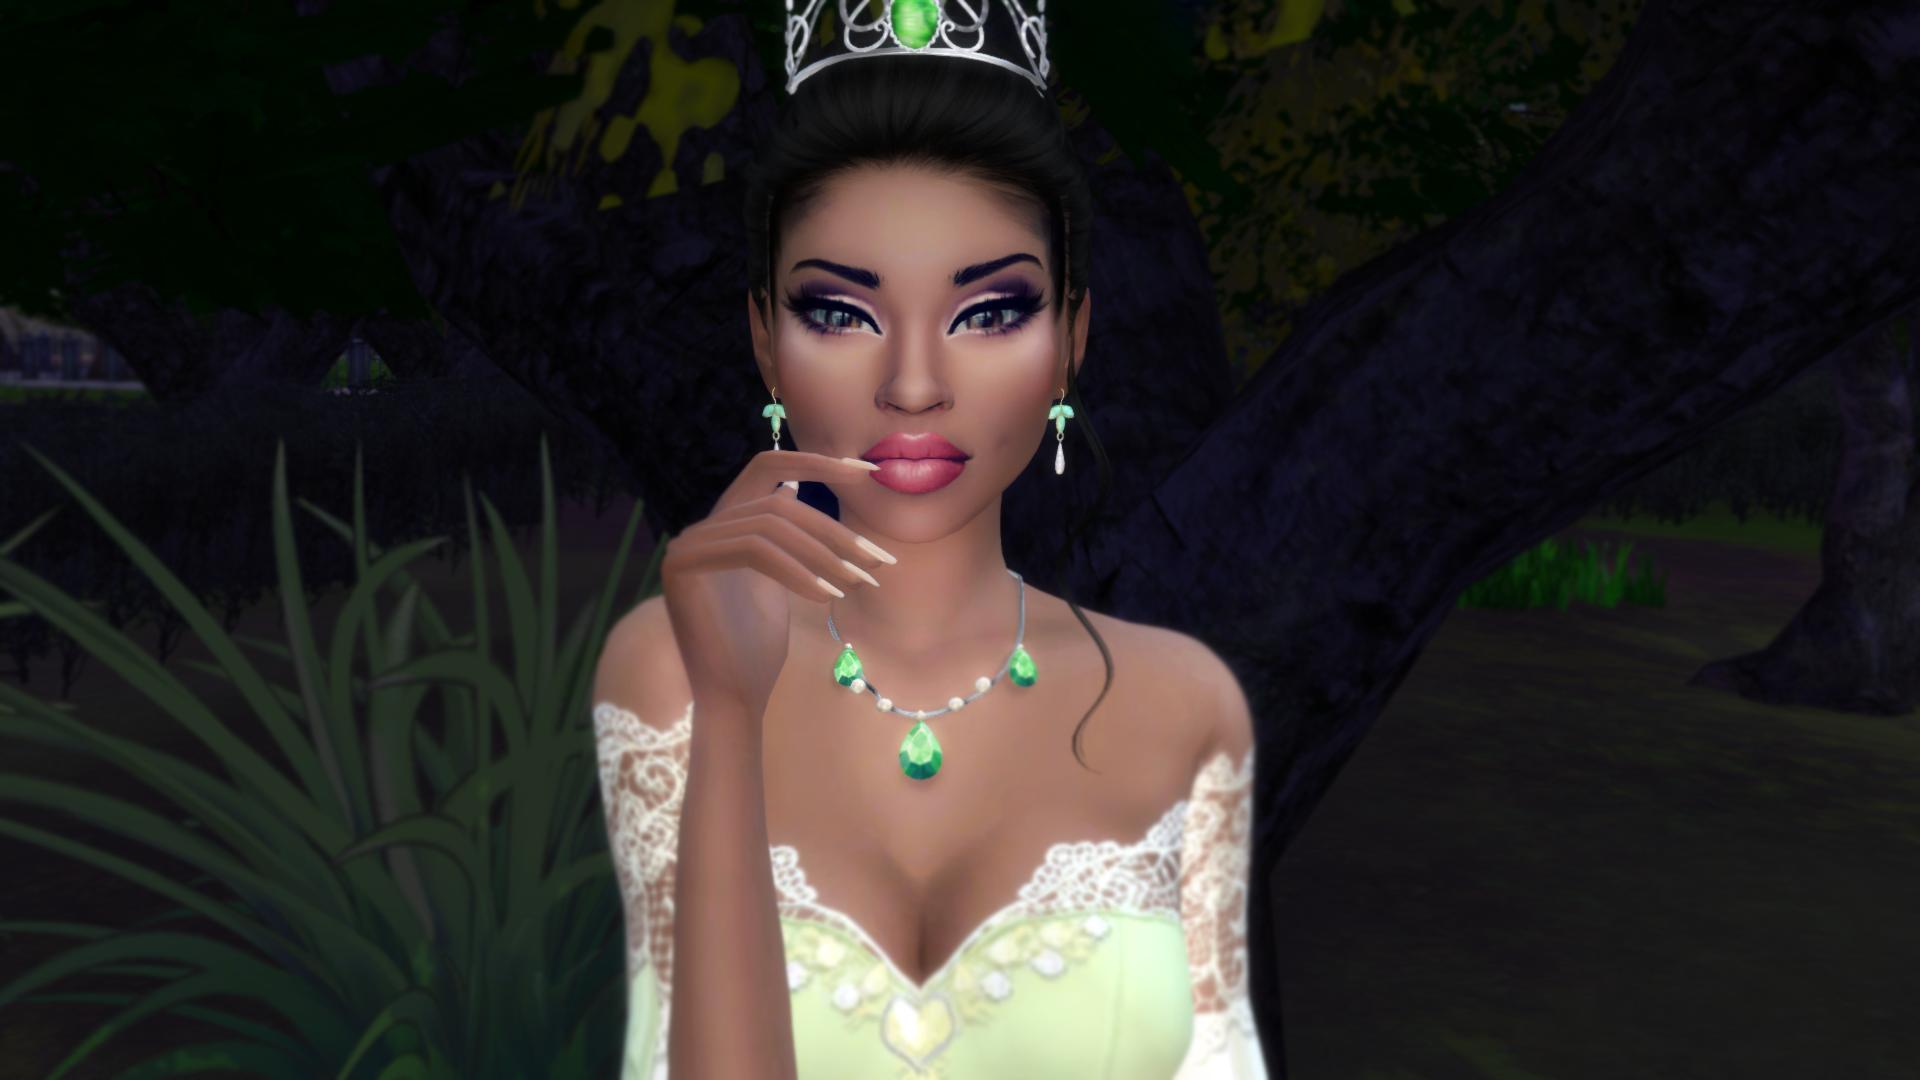 The Sims 4 I The Princess And The Frog I Tiana